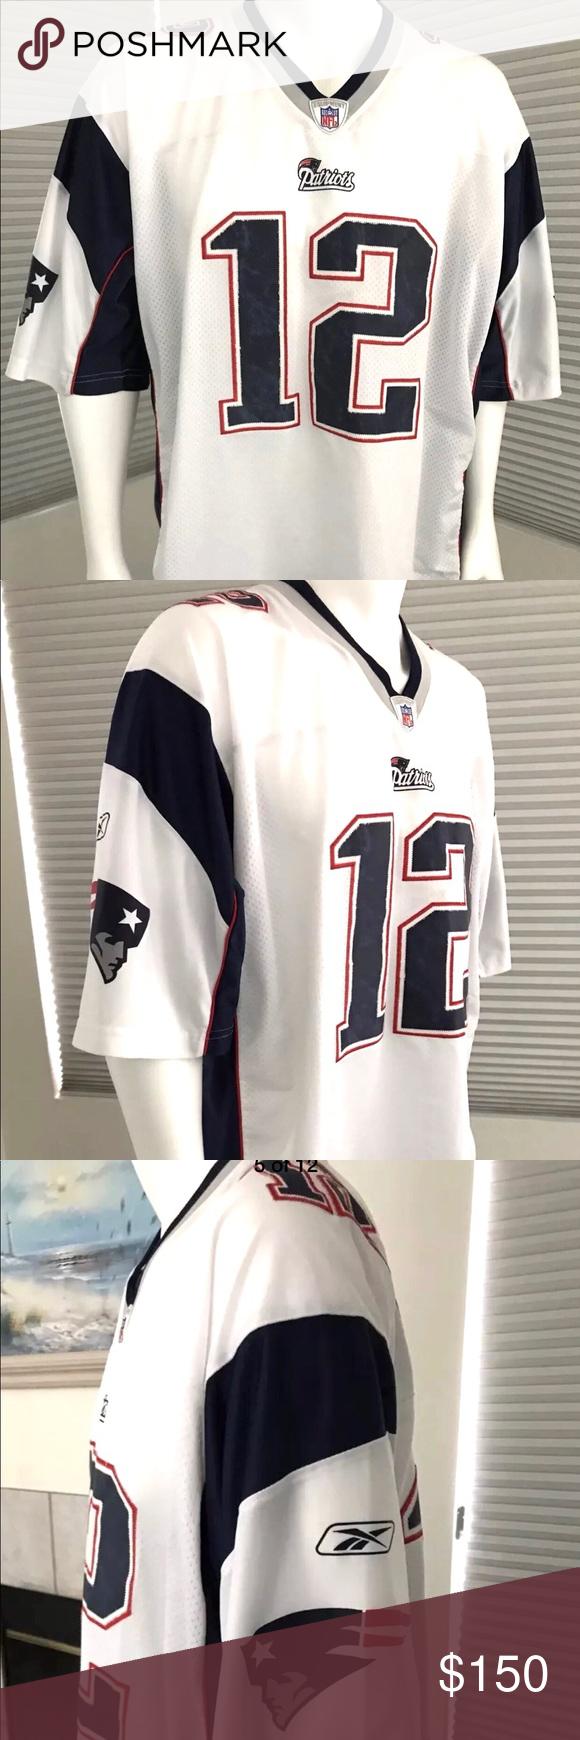 NFL Jersey Tom Brady 2XL/2EG/2GT Reebok | Reebok, Clothing care ...